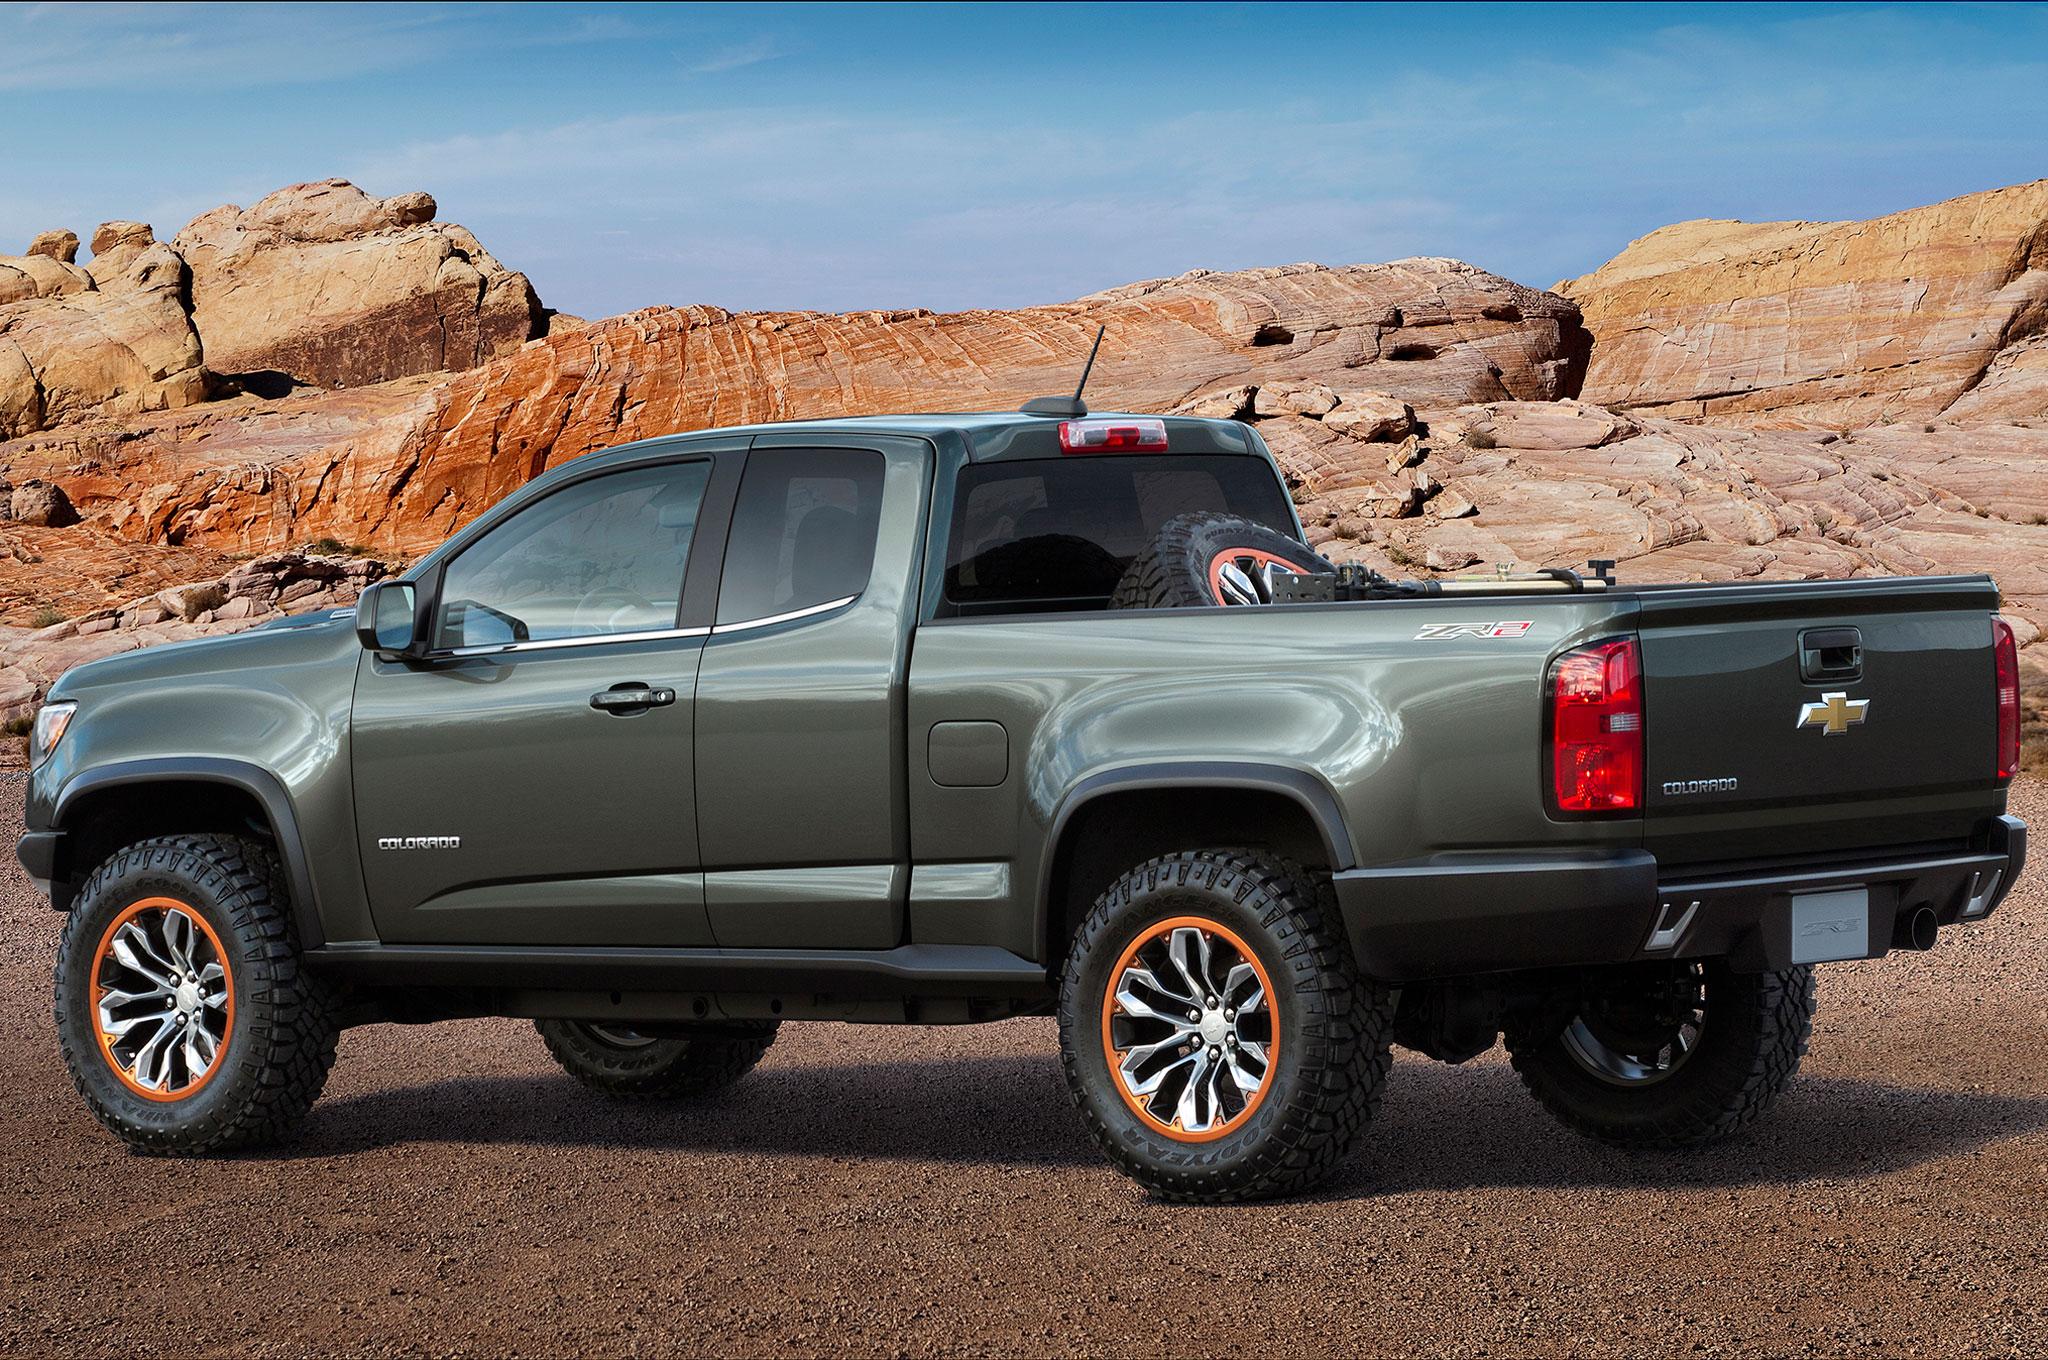 2017 Chevrolet Colorado And Gmc Canyon Review